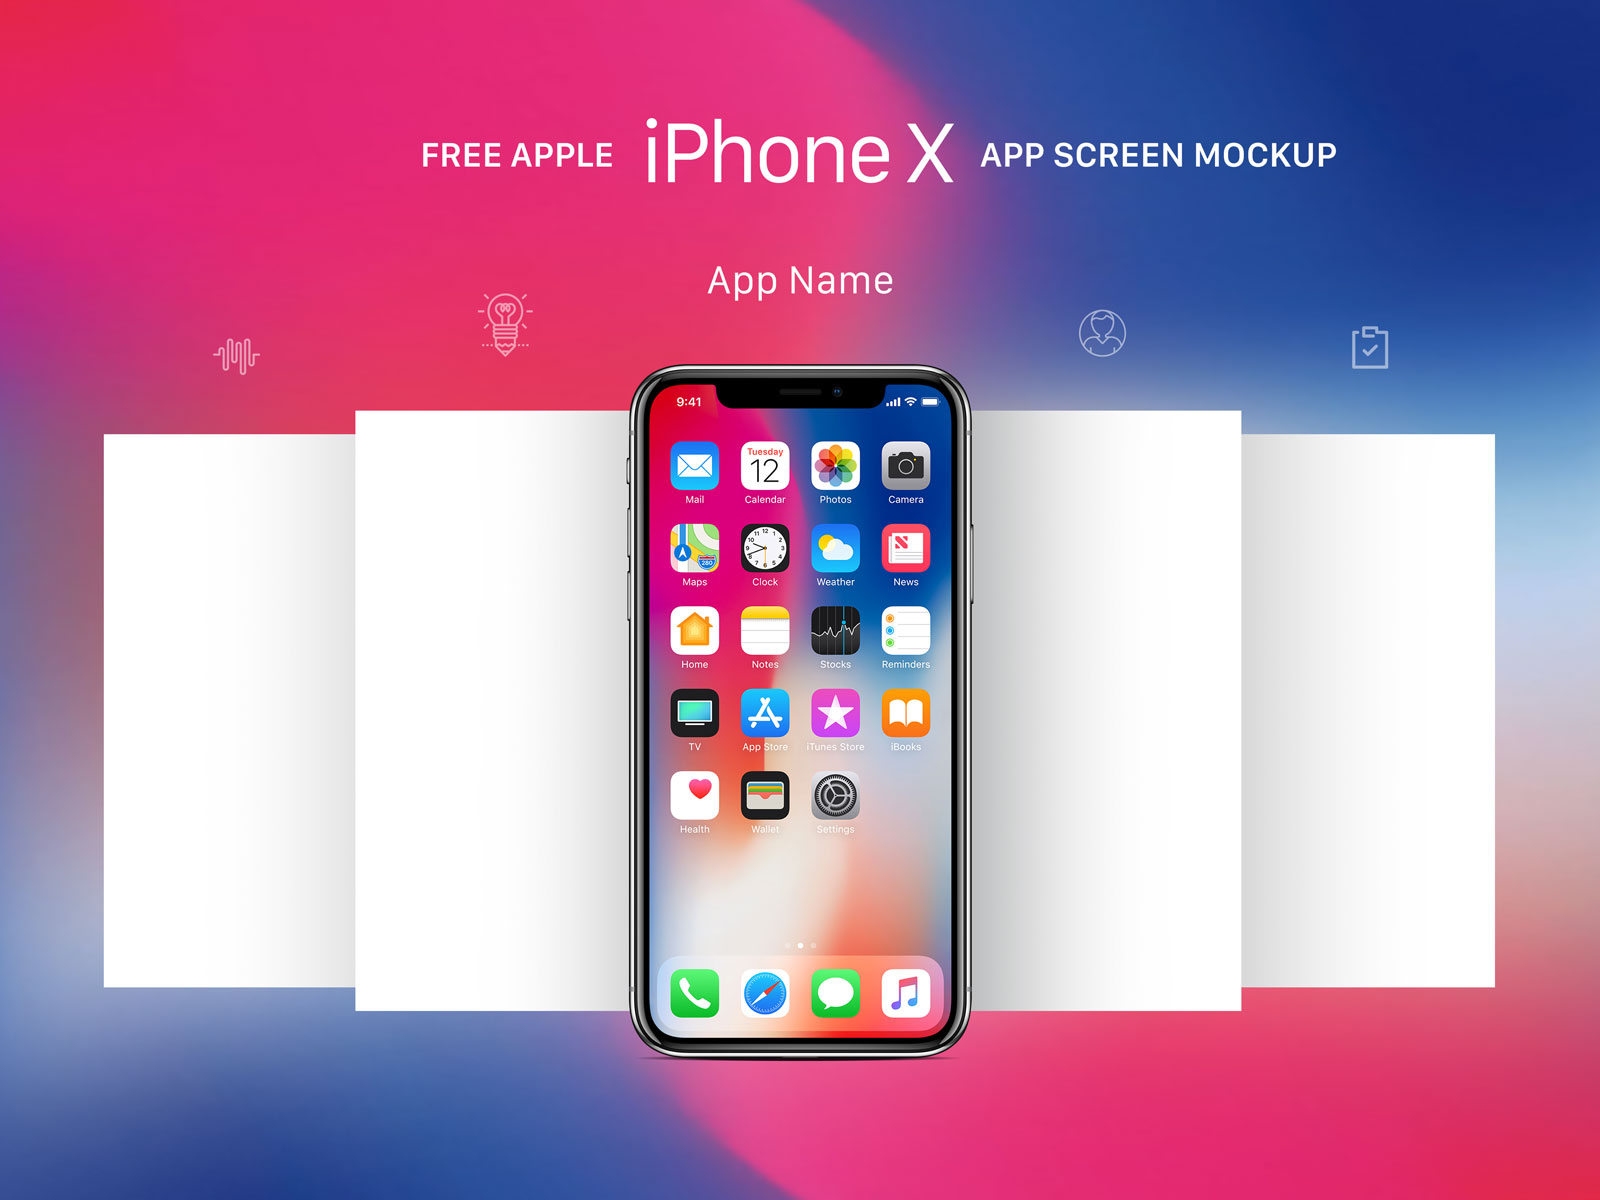 60 Apple Iphone X Mockup Templates Decolore